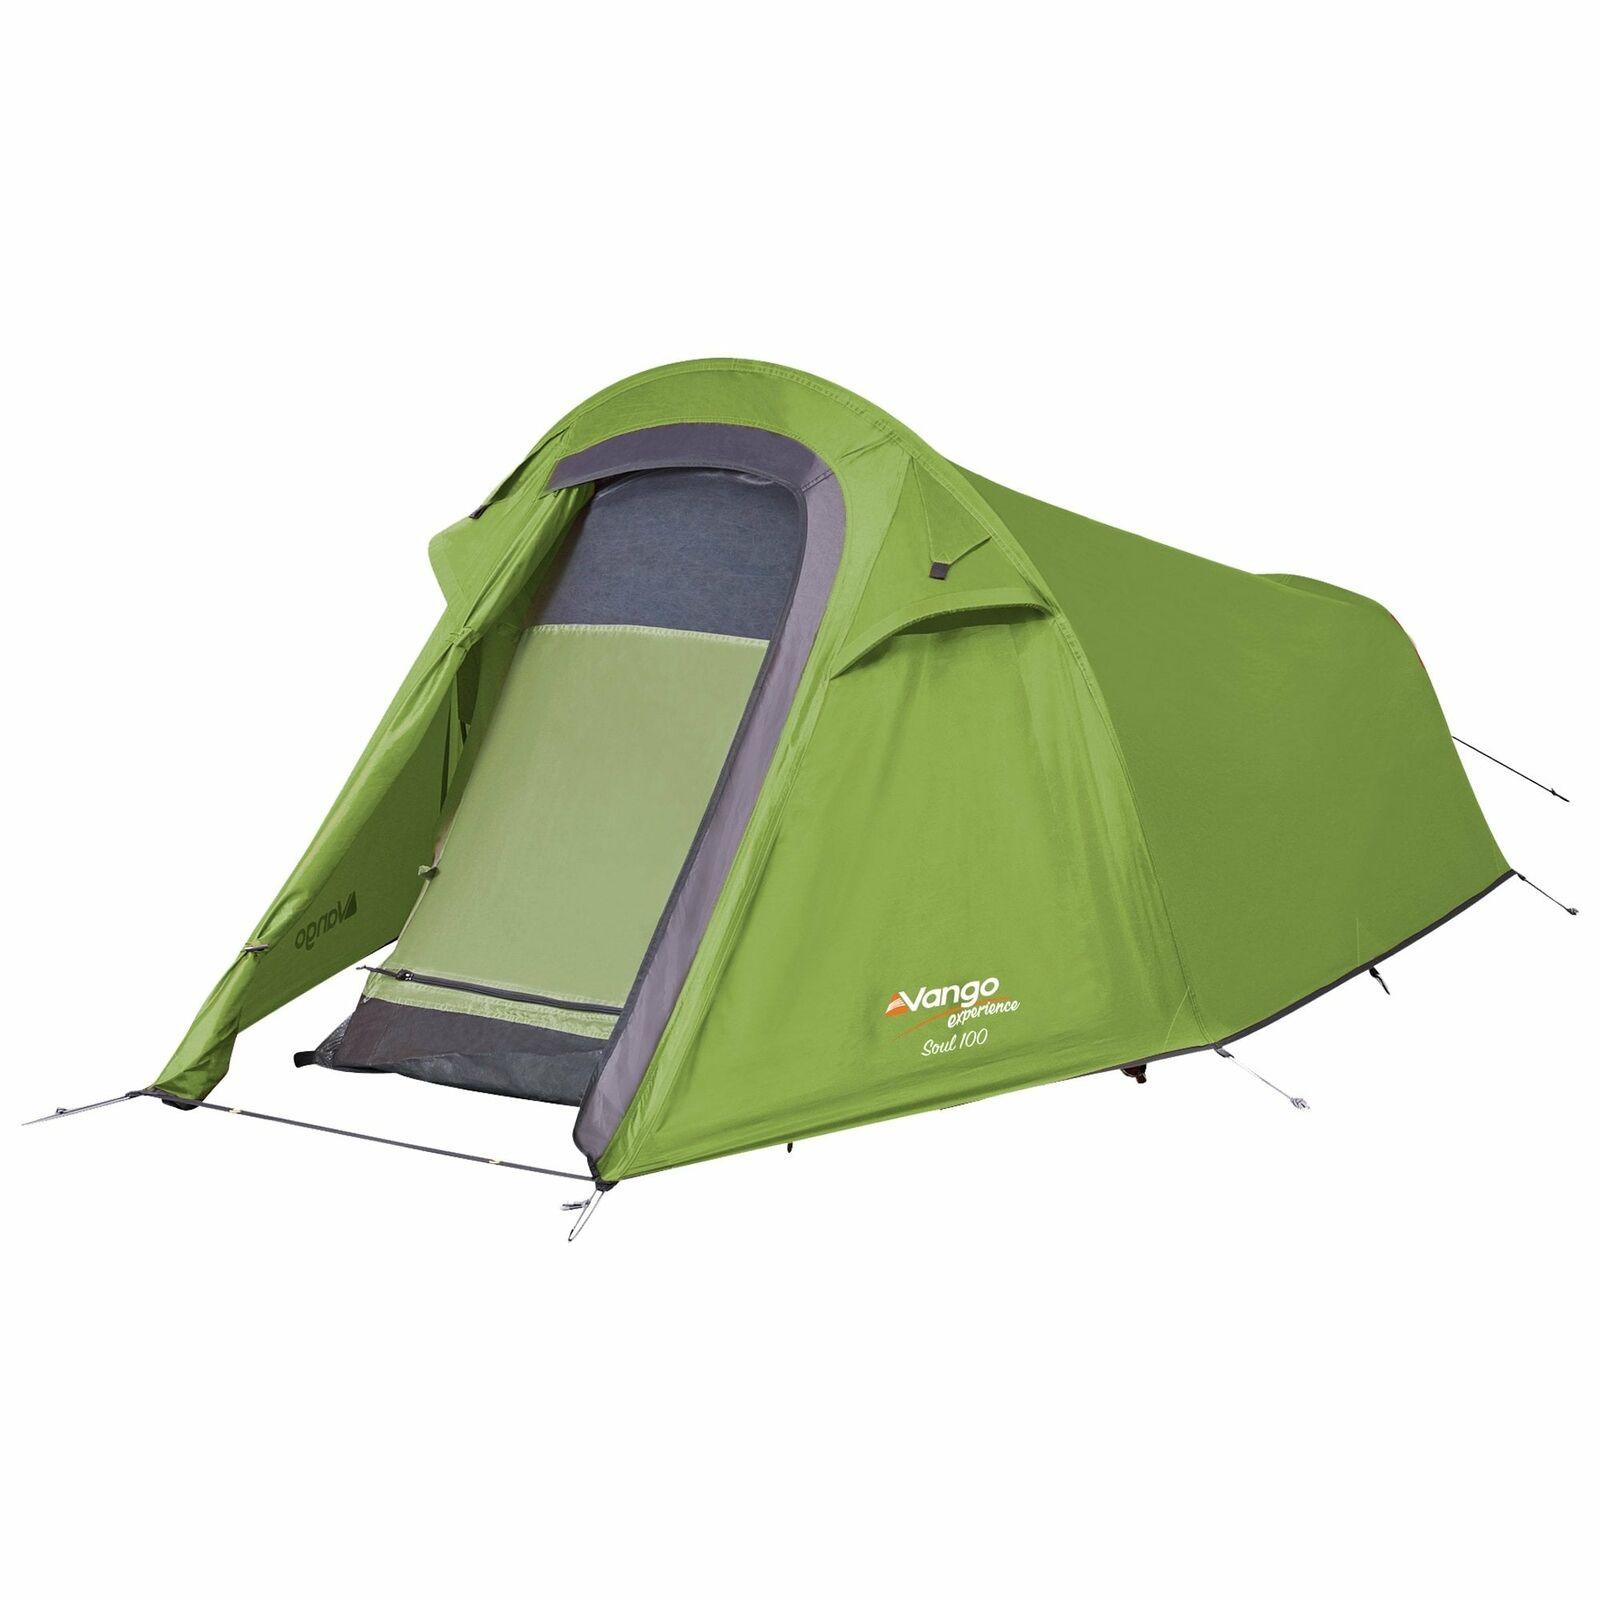 Vango Soul 100 1 Person Tent - Grün